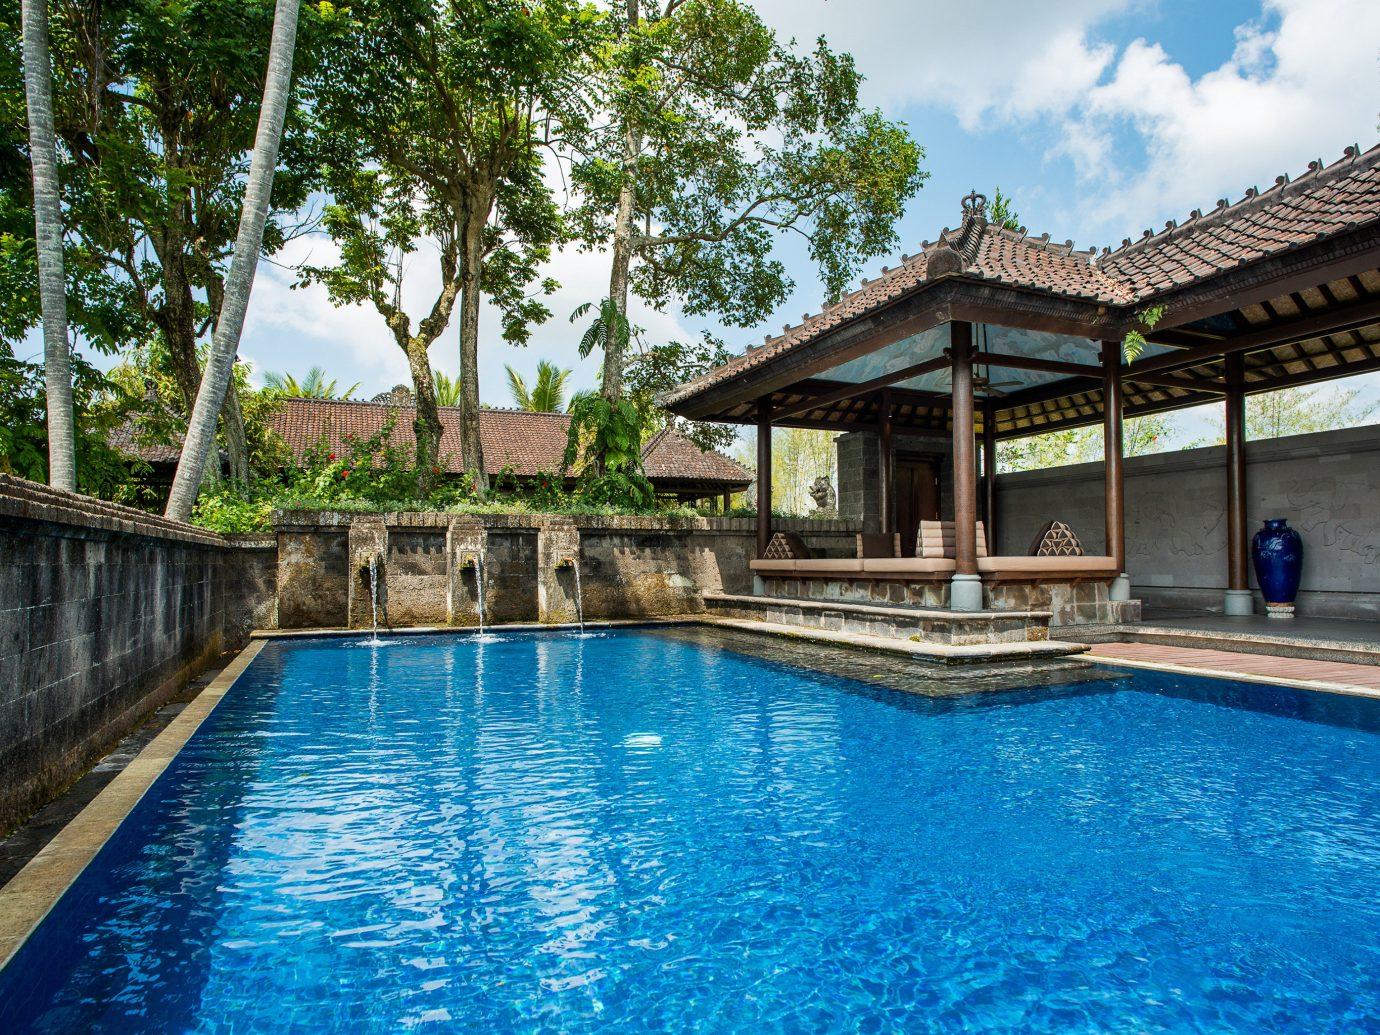 Hotels Luxury Pool Villa building tree outdoor water swimming pool property Resort leisure estate house swimming blue resort town mansion real estate backyard stone